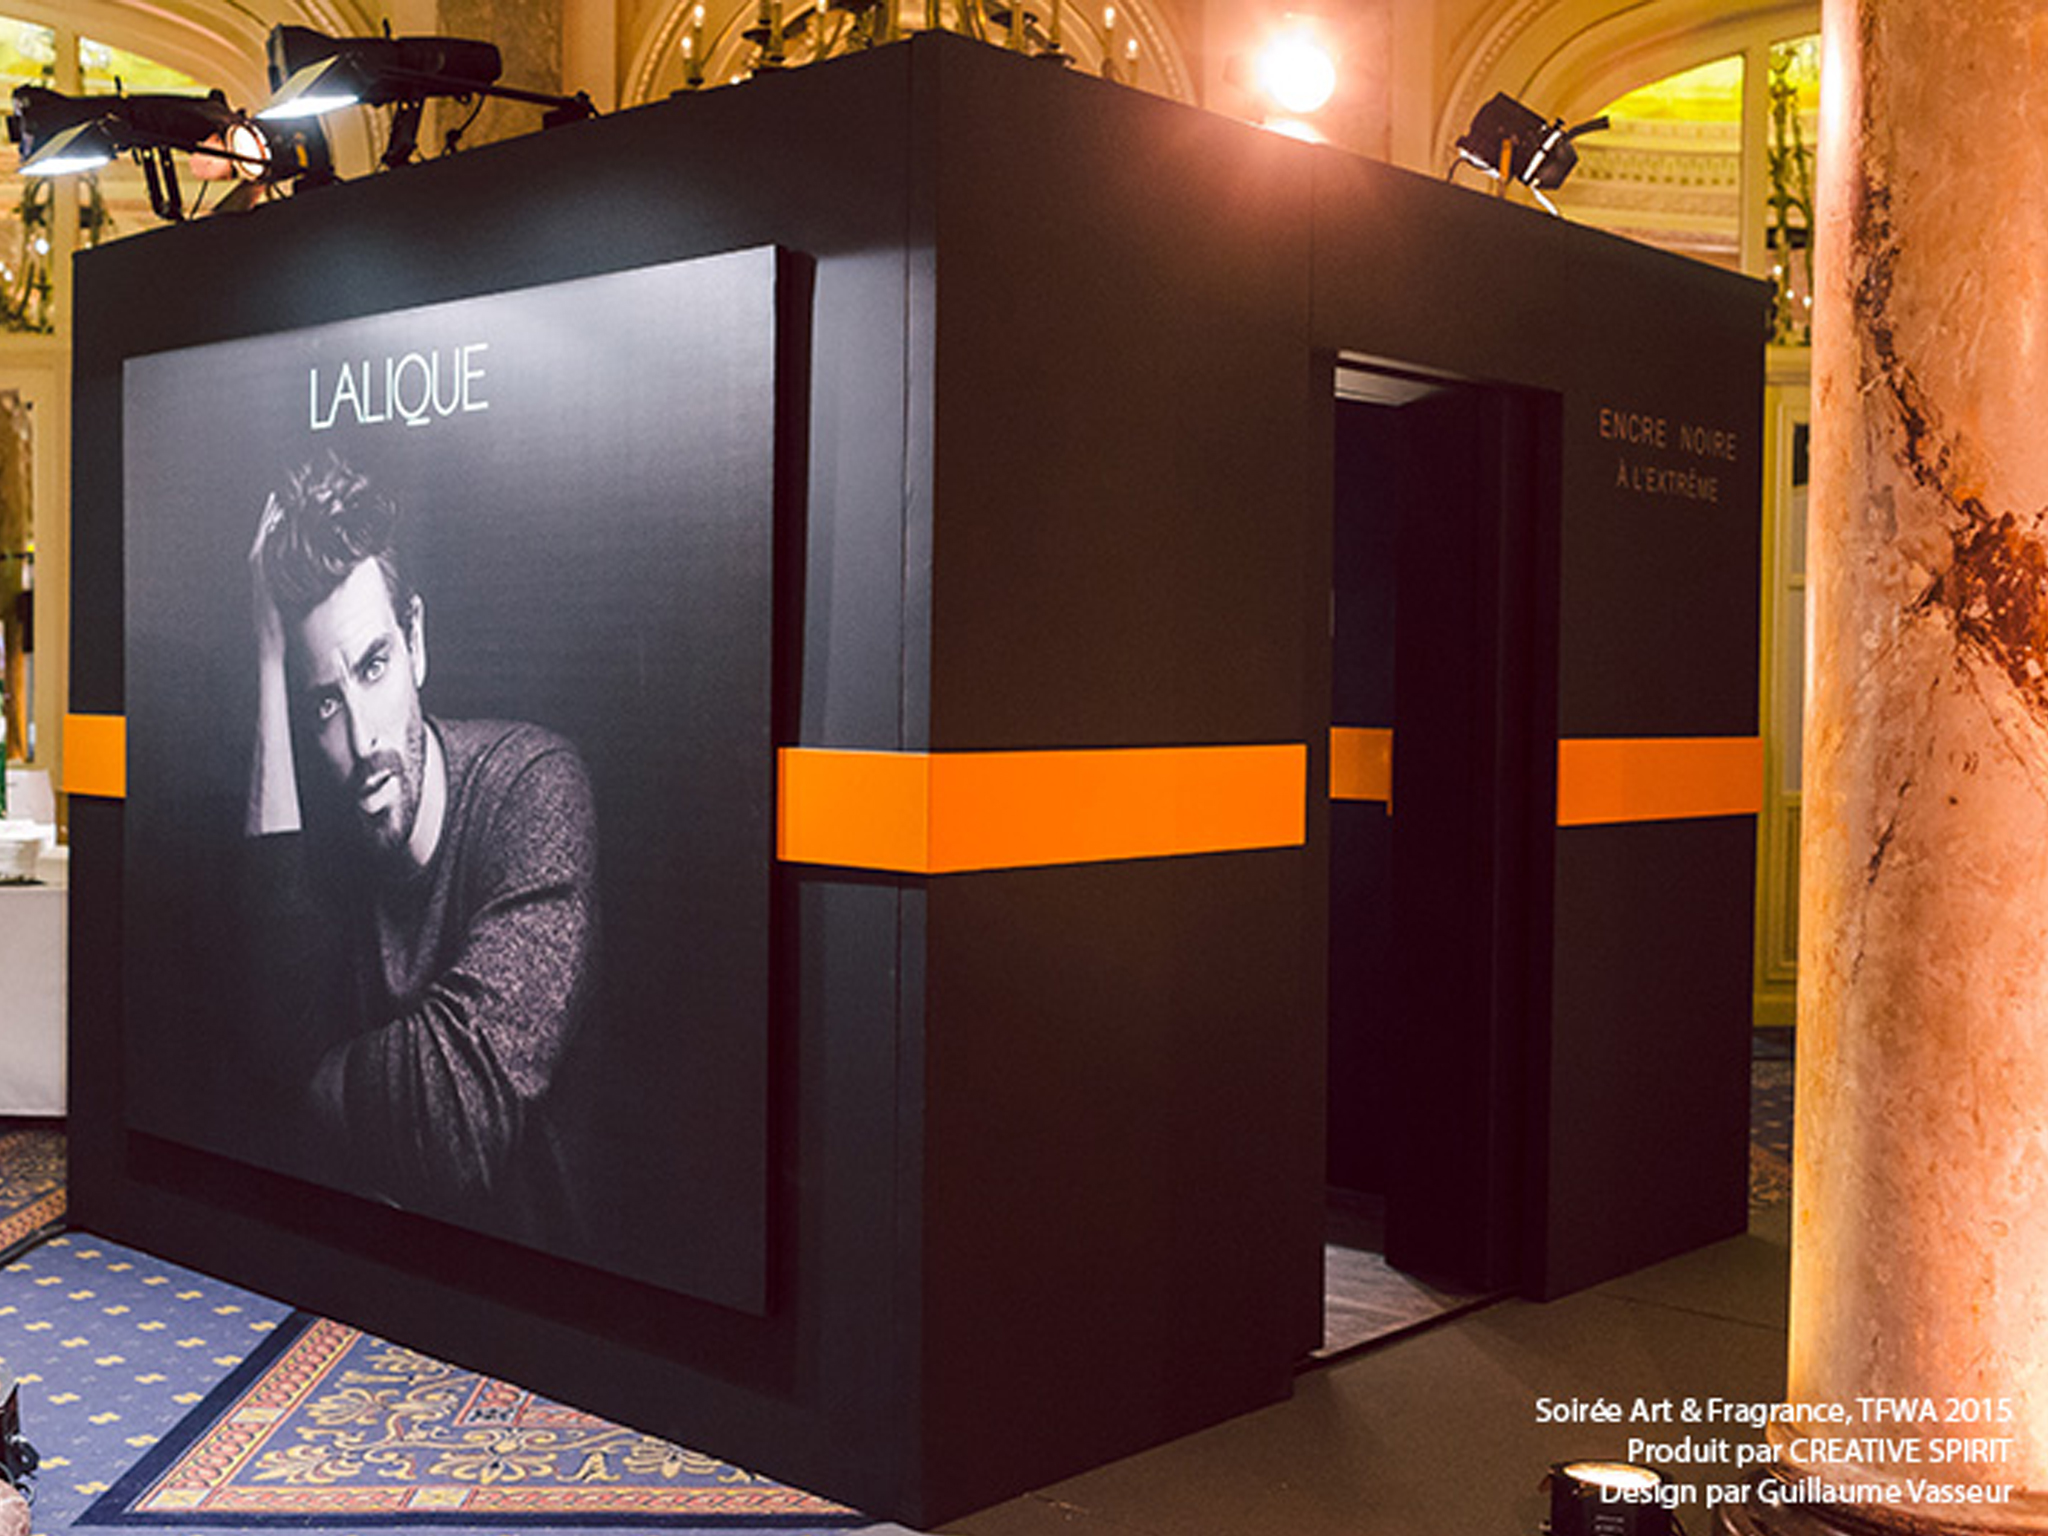 Soirée Art & Fragrance, TFWA 2015 - Creative Spirit